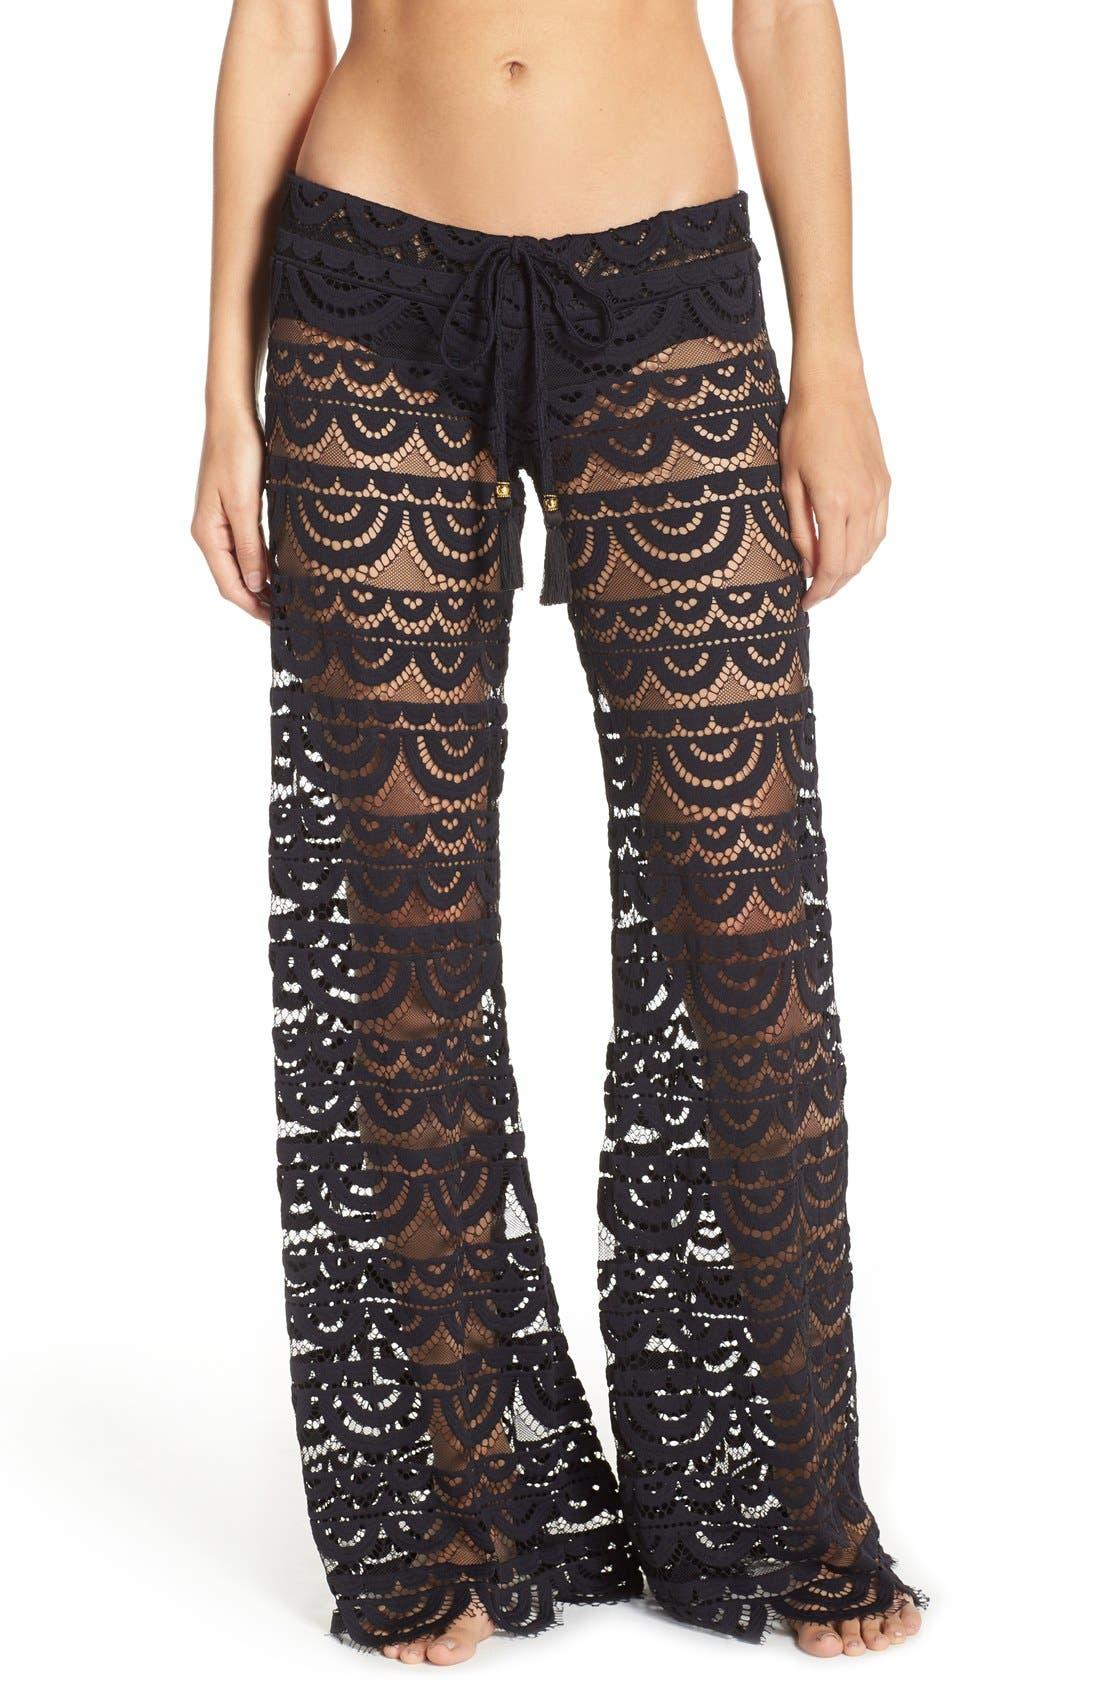 Alternate Image 1 Selected - PilyQ 'Malibu' Lace Cover-Up Pants